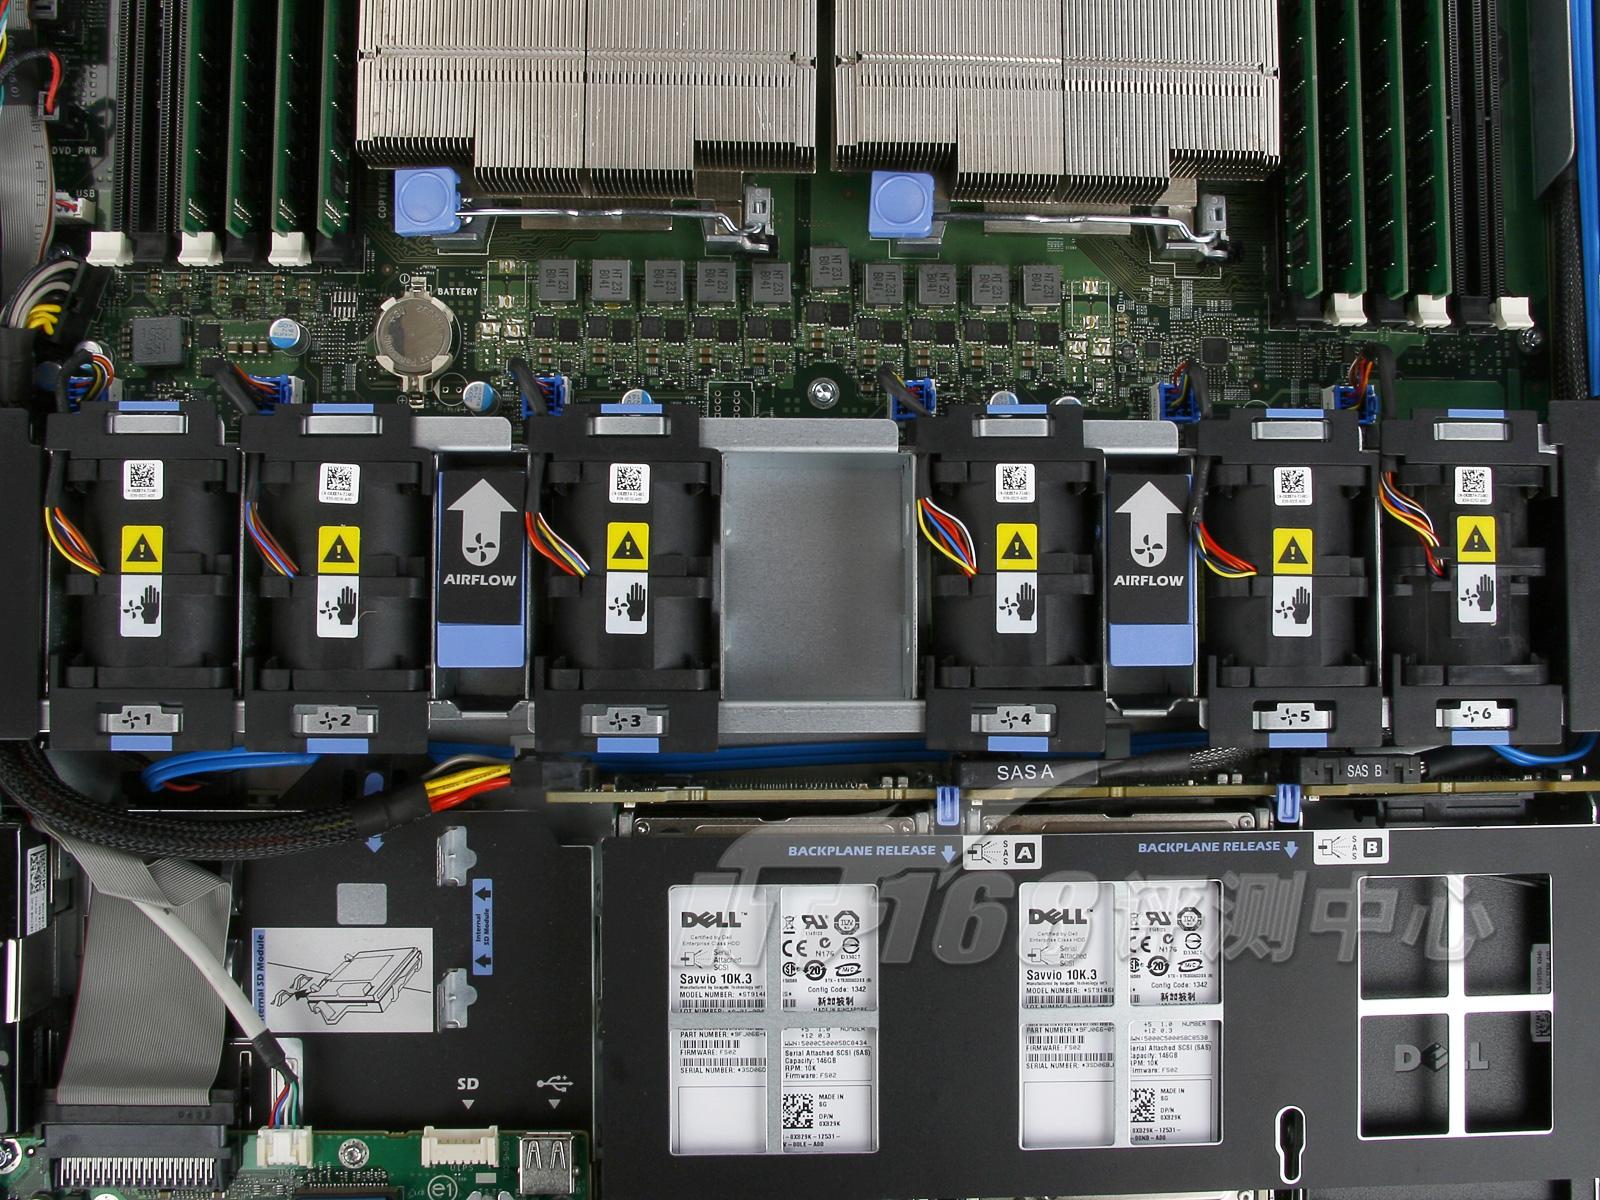 dell最新一代r610服务器:处理器子系统-第十一代